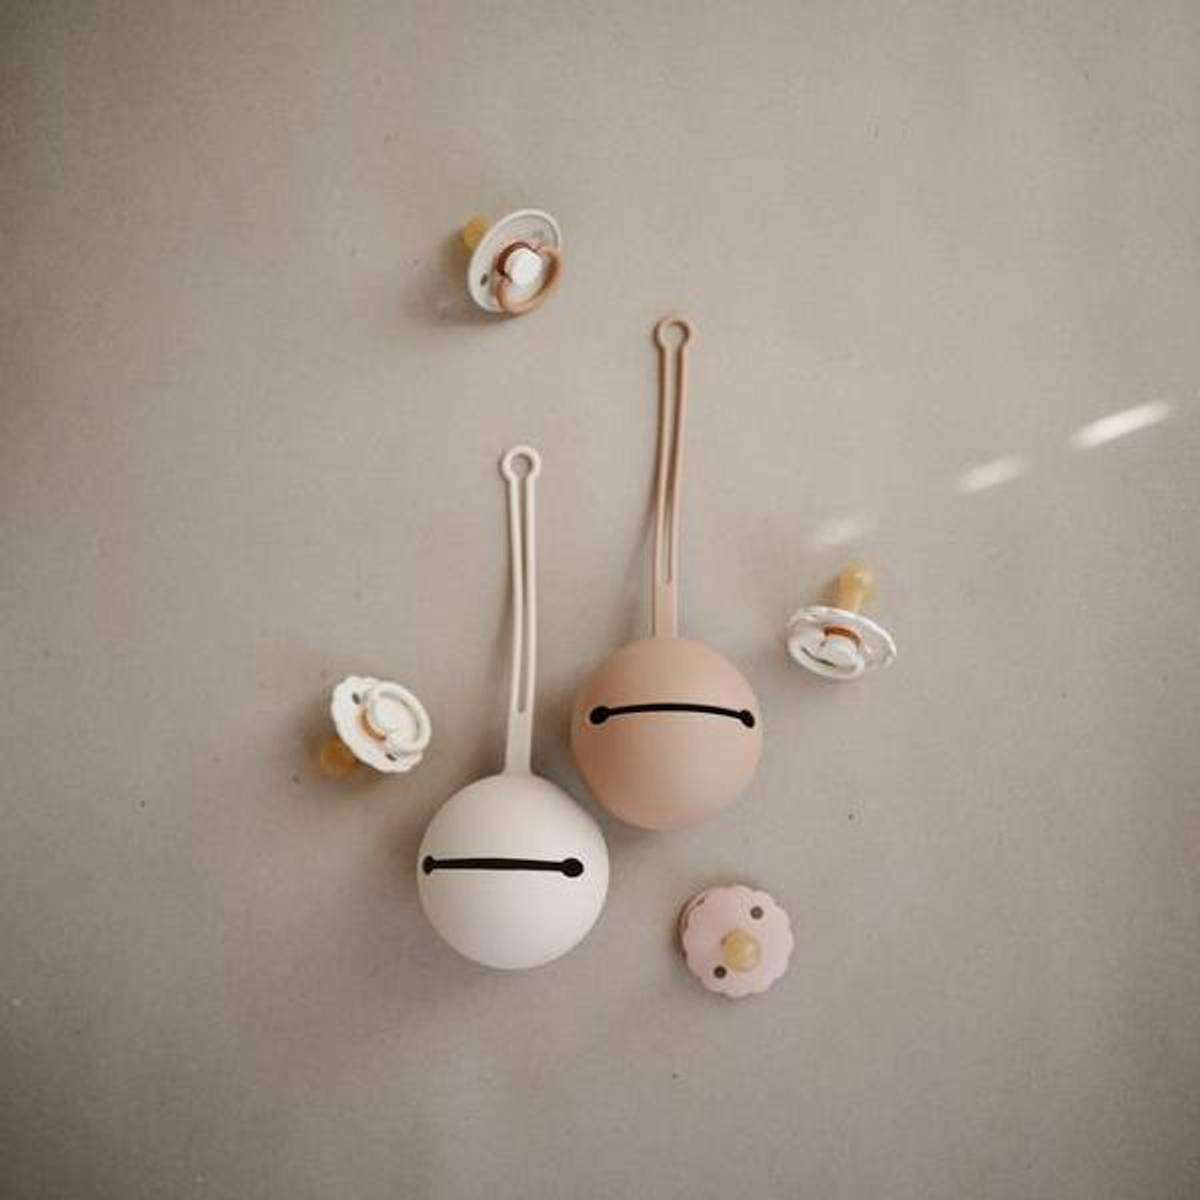 Smokkbeholder Silikon - Mushie - Sand